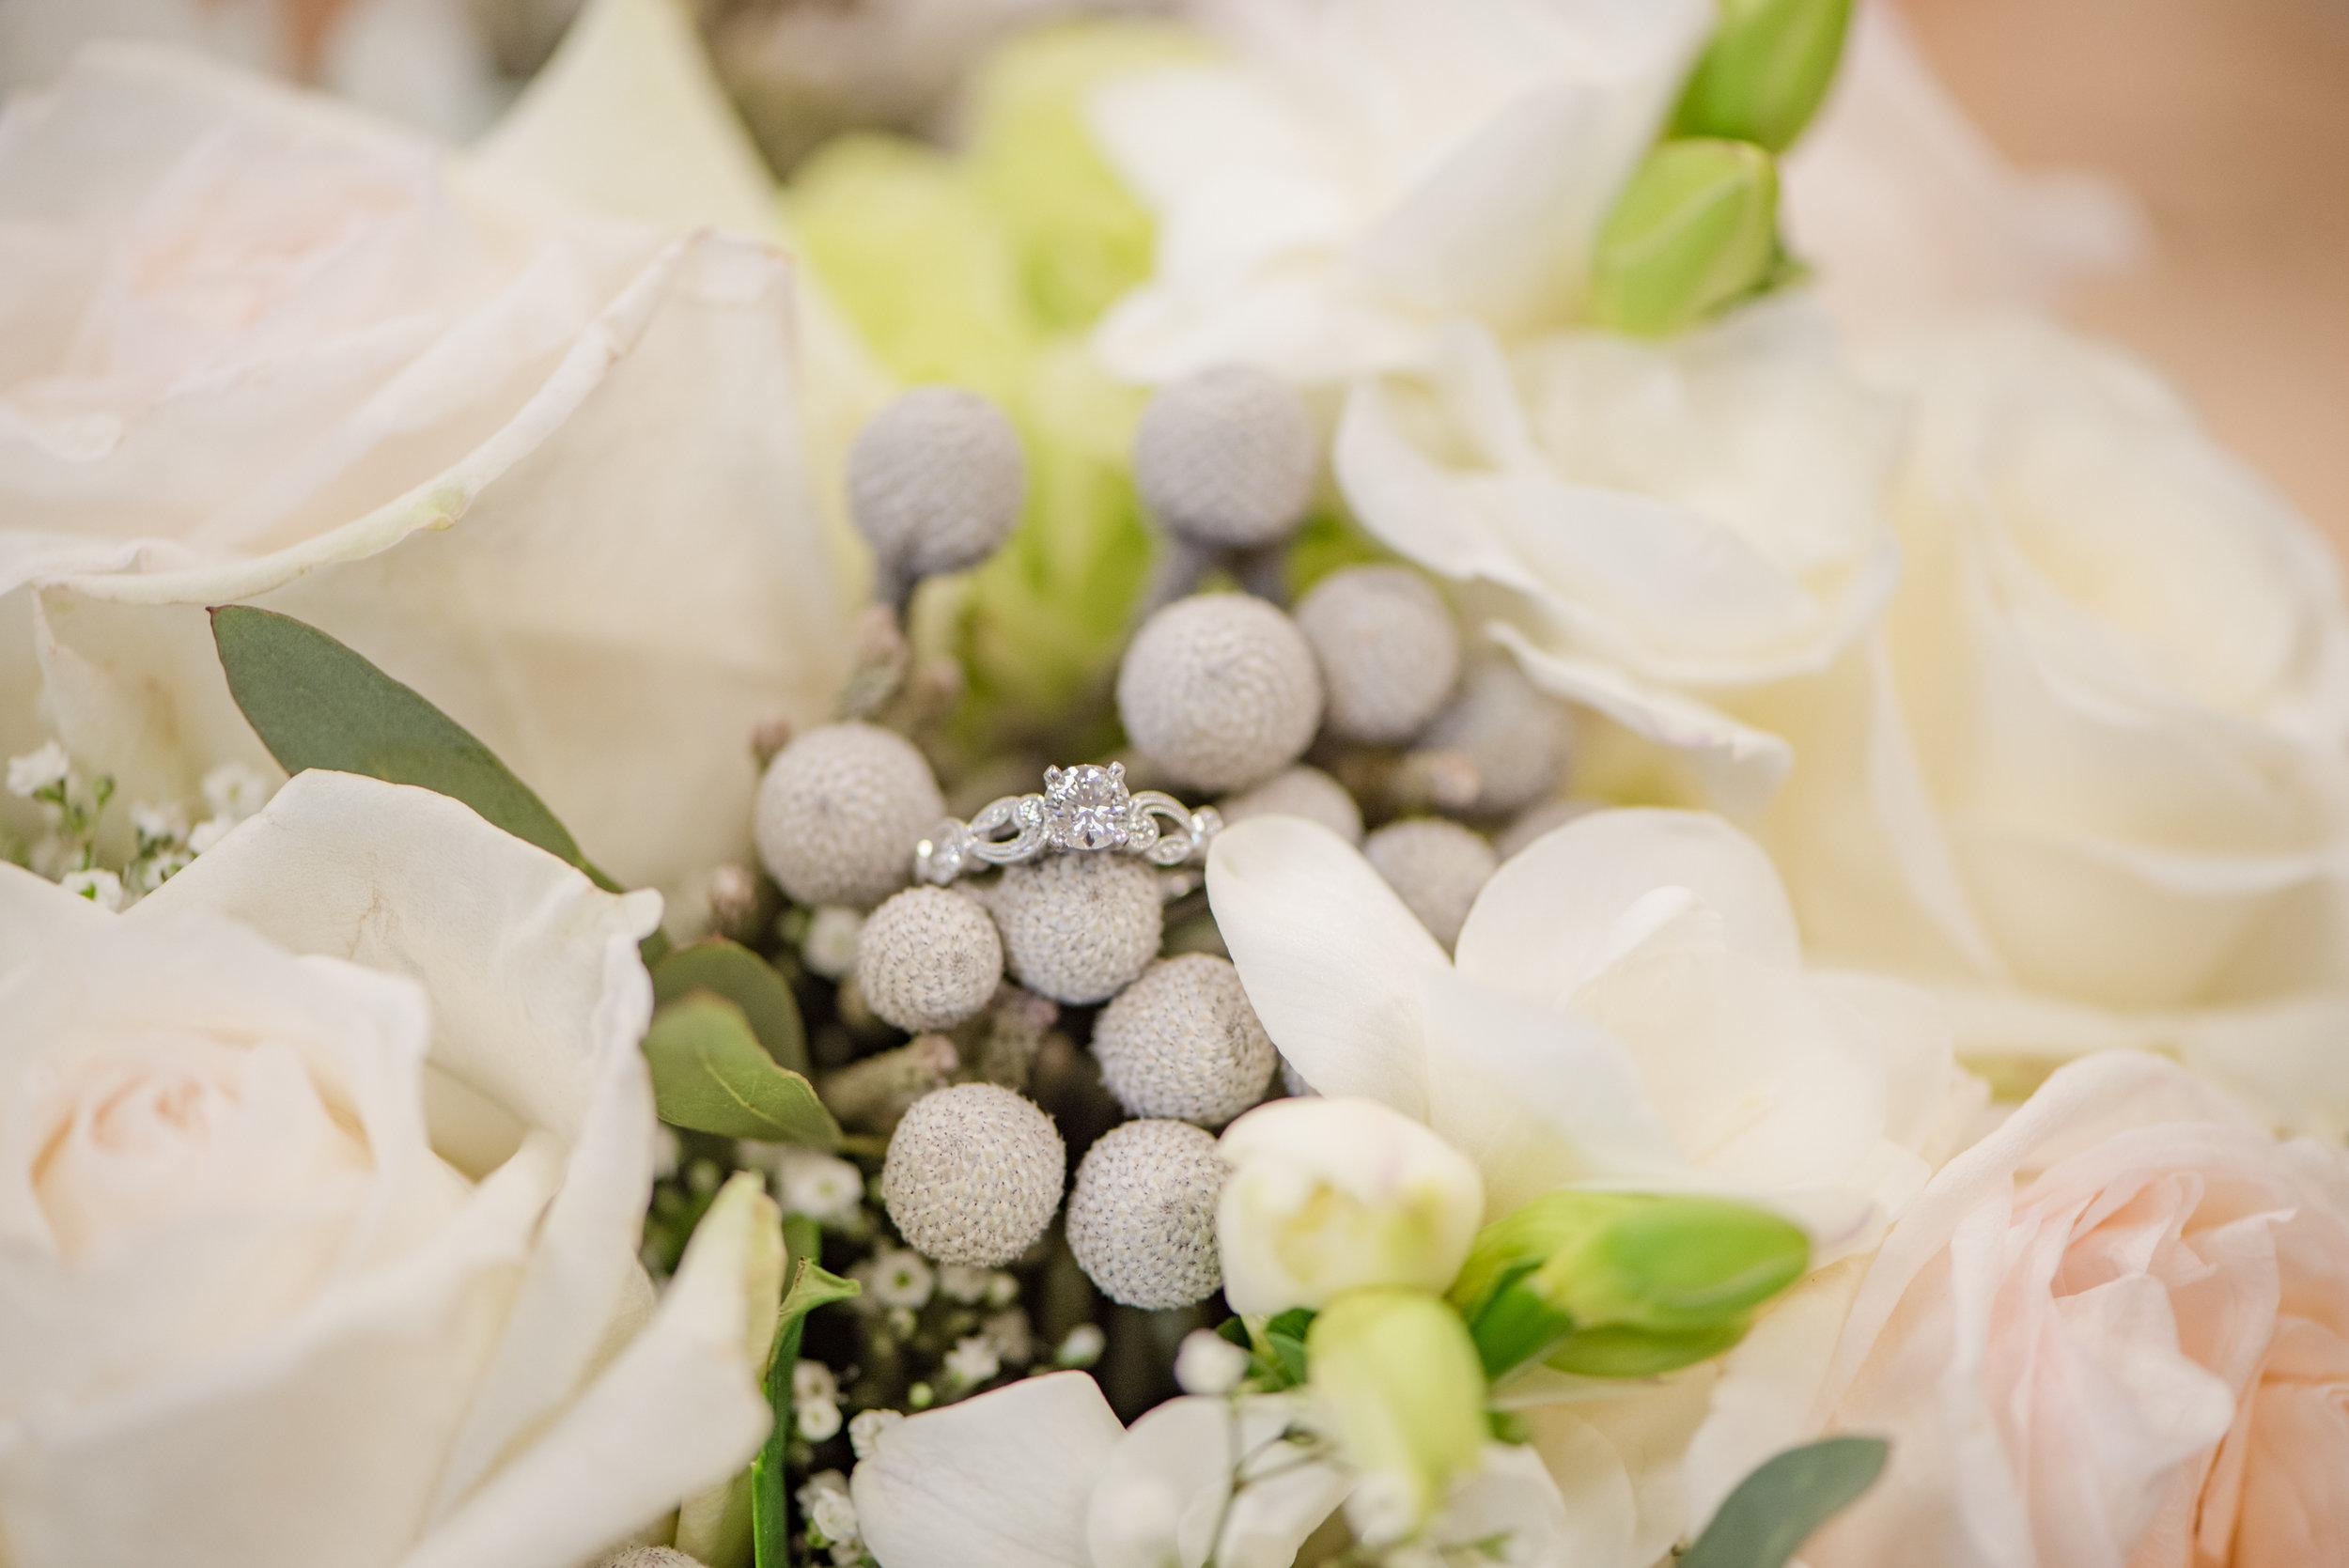 Highland Meadows Golf Course Wedding | Windsor CO Wedding Photographer | Kristen Rush Photography, www.kristenrushphotography.com